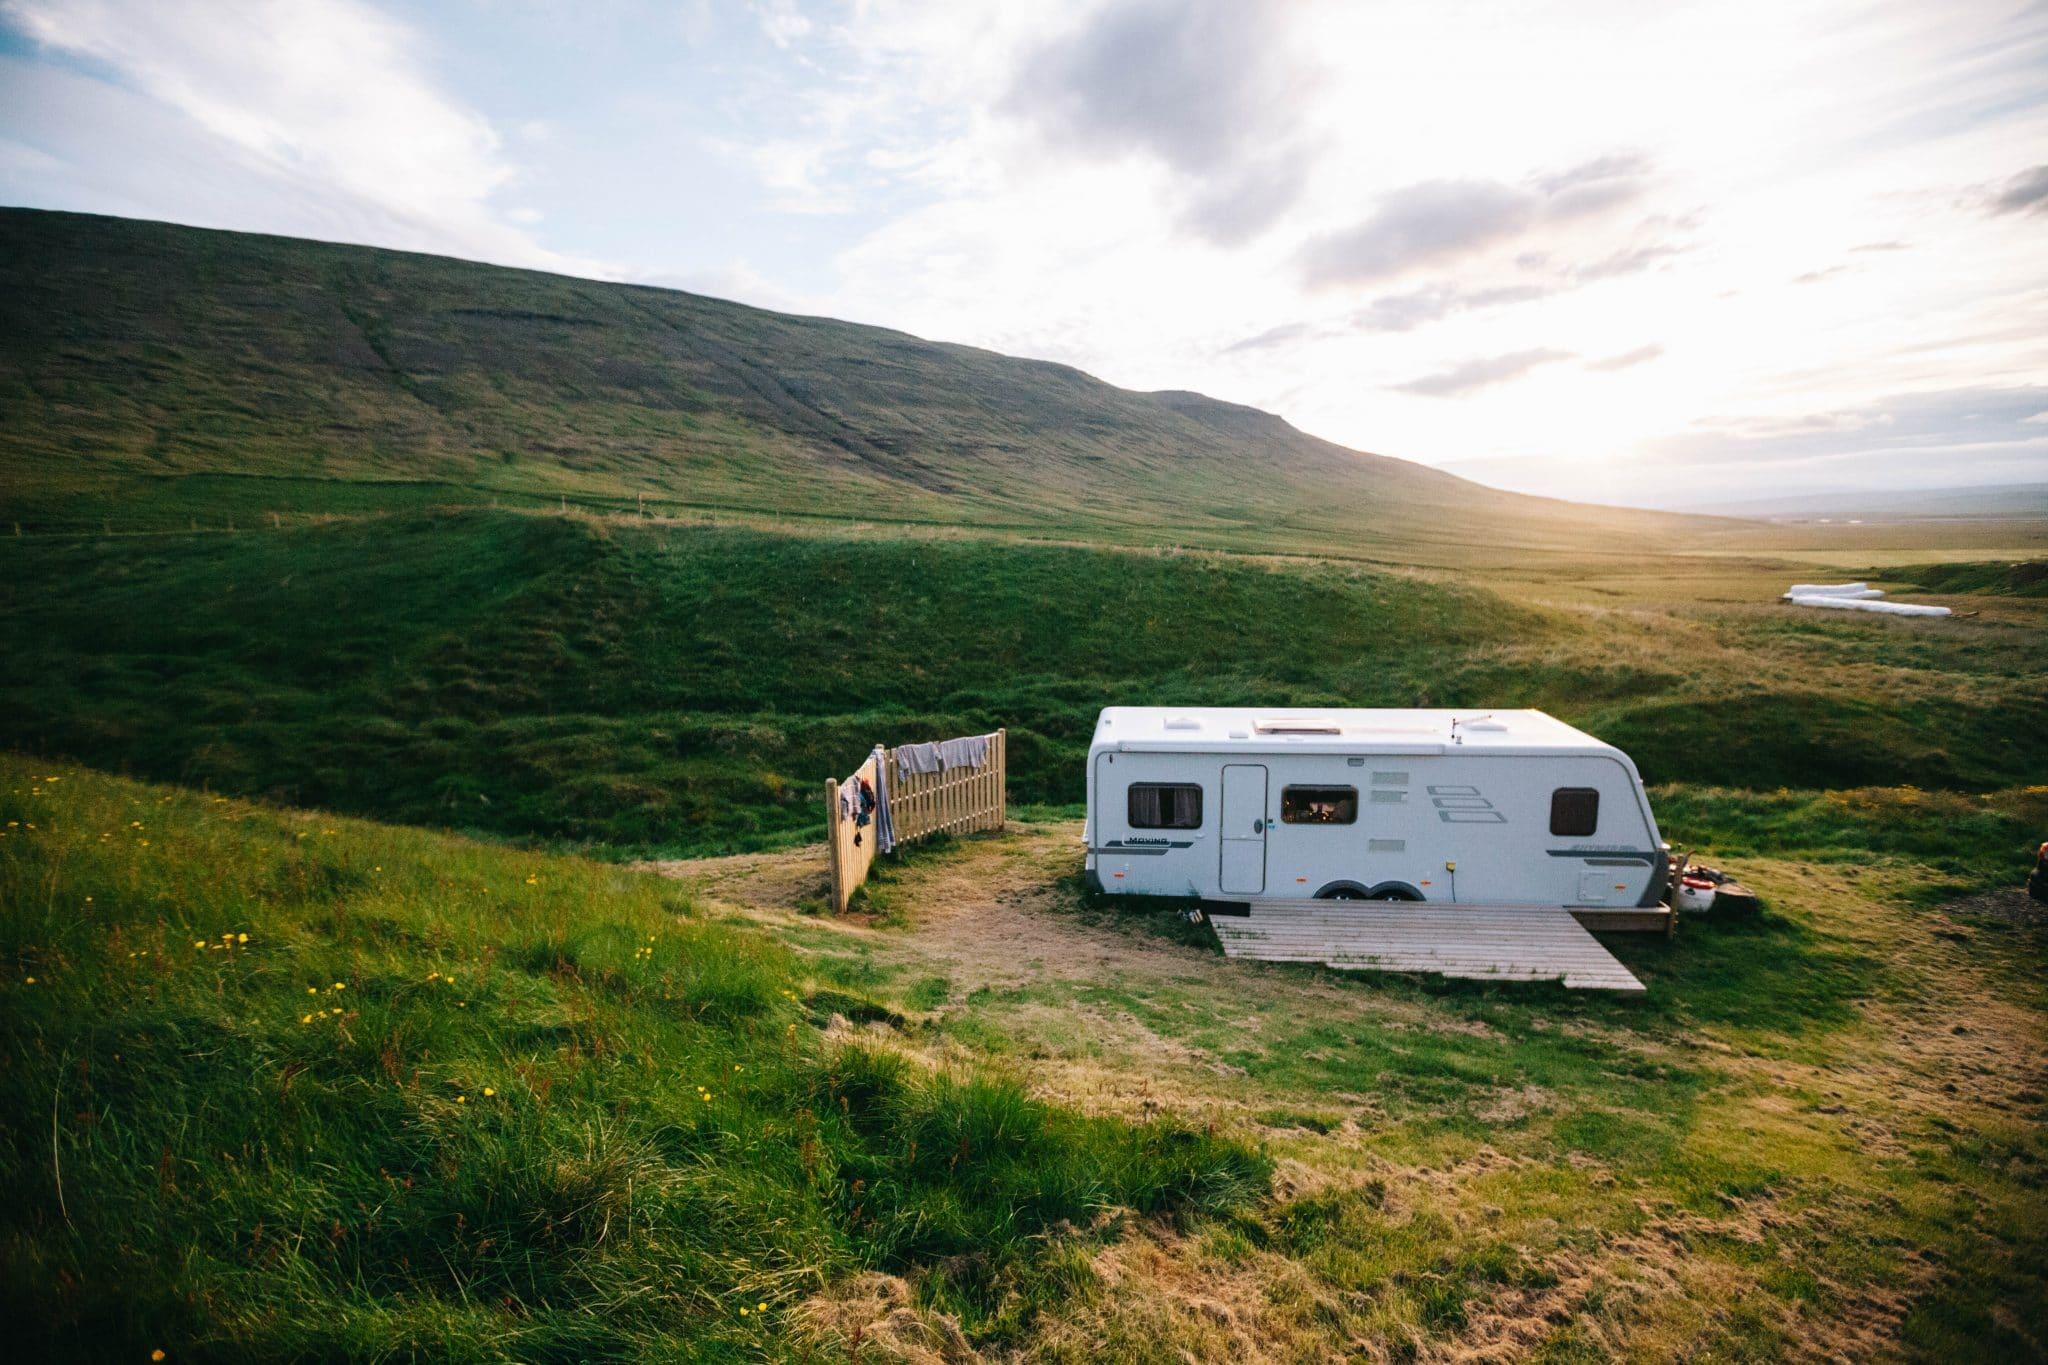 Islanti - Mitä maksaa Islannin road trip?